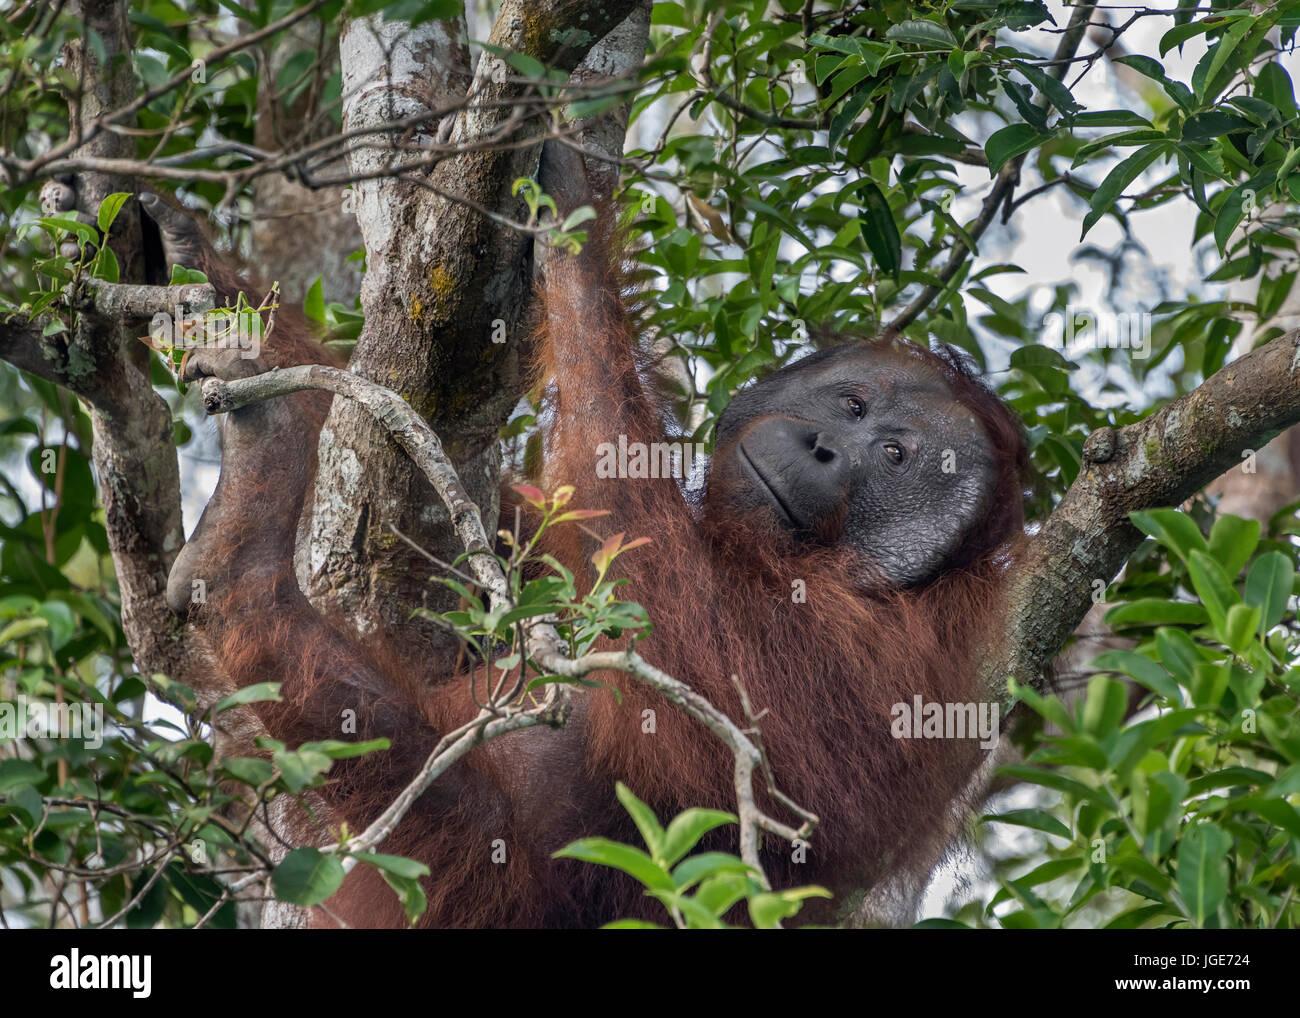 Sorridente orangutan alta nella struttura ad albero, Tanjung messa National Park, Kalimantan, Indonesia Immagini Stock